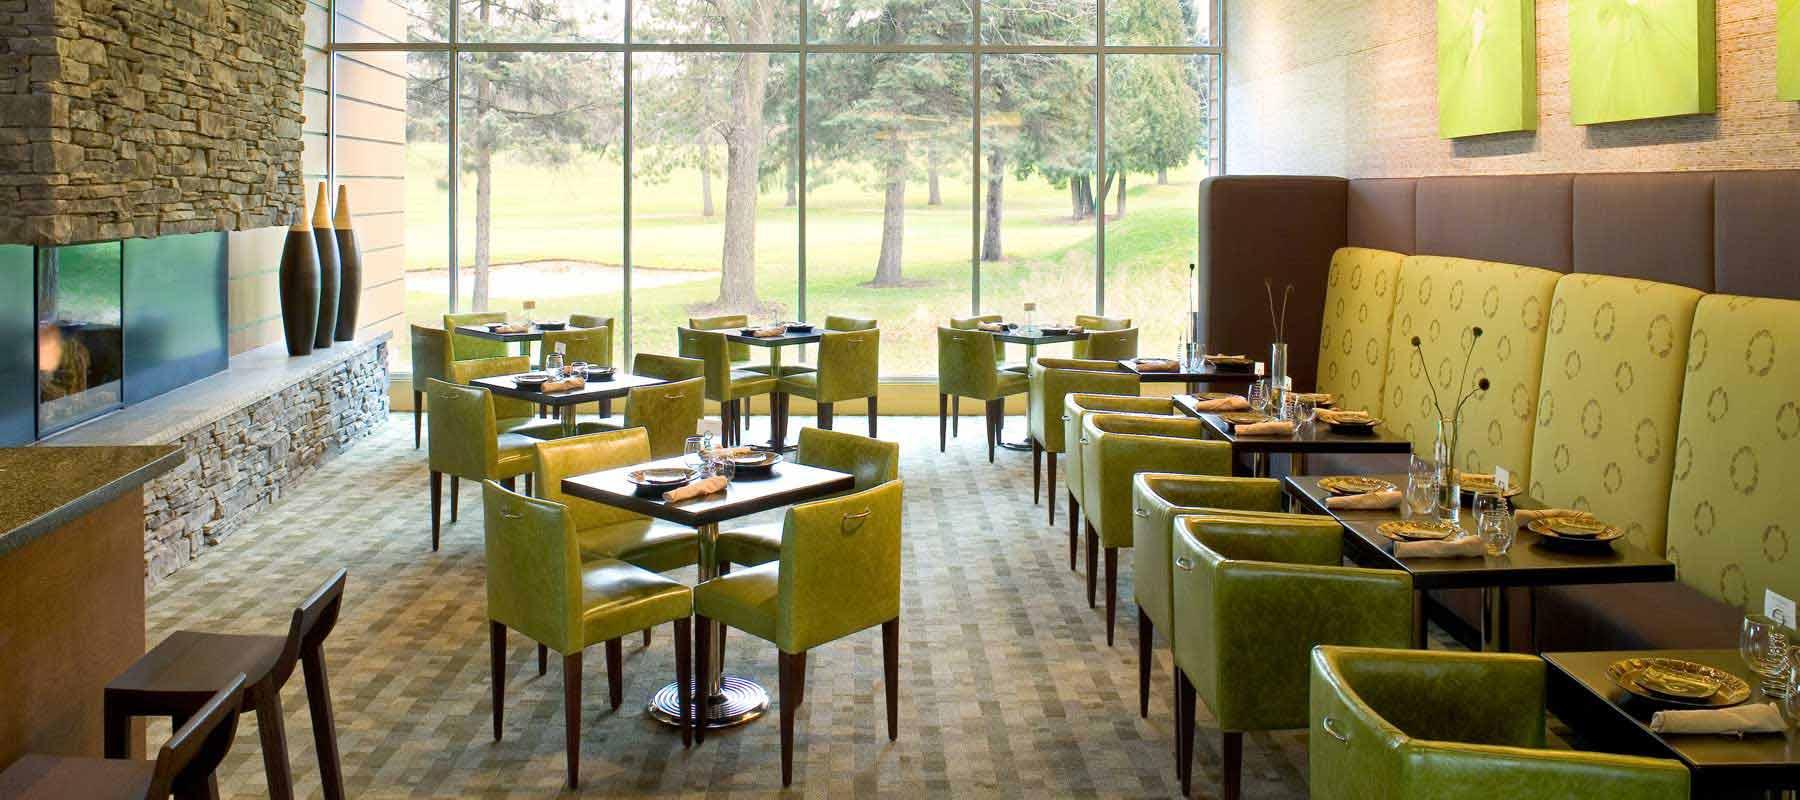 Spa Cafe Dining Room